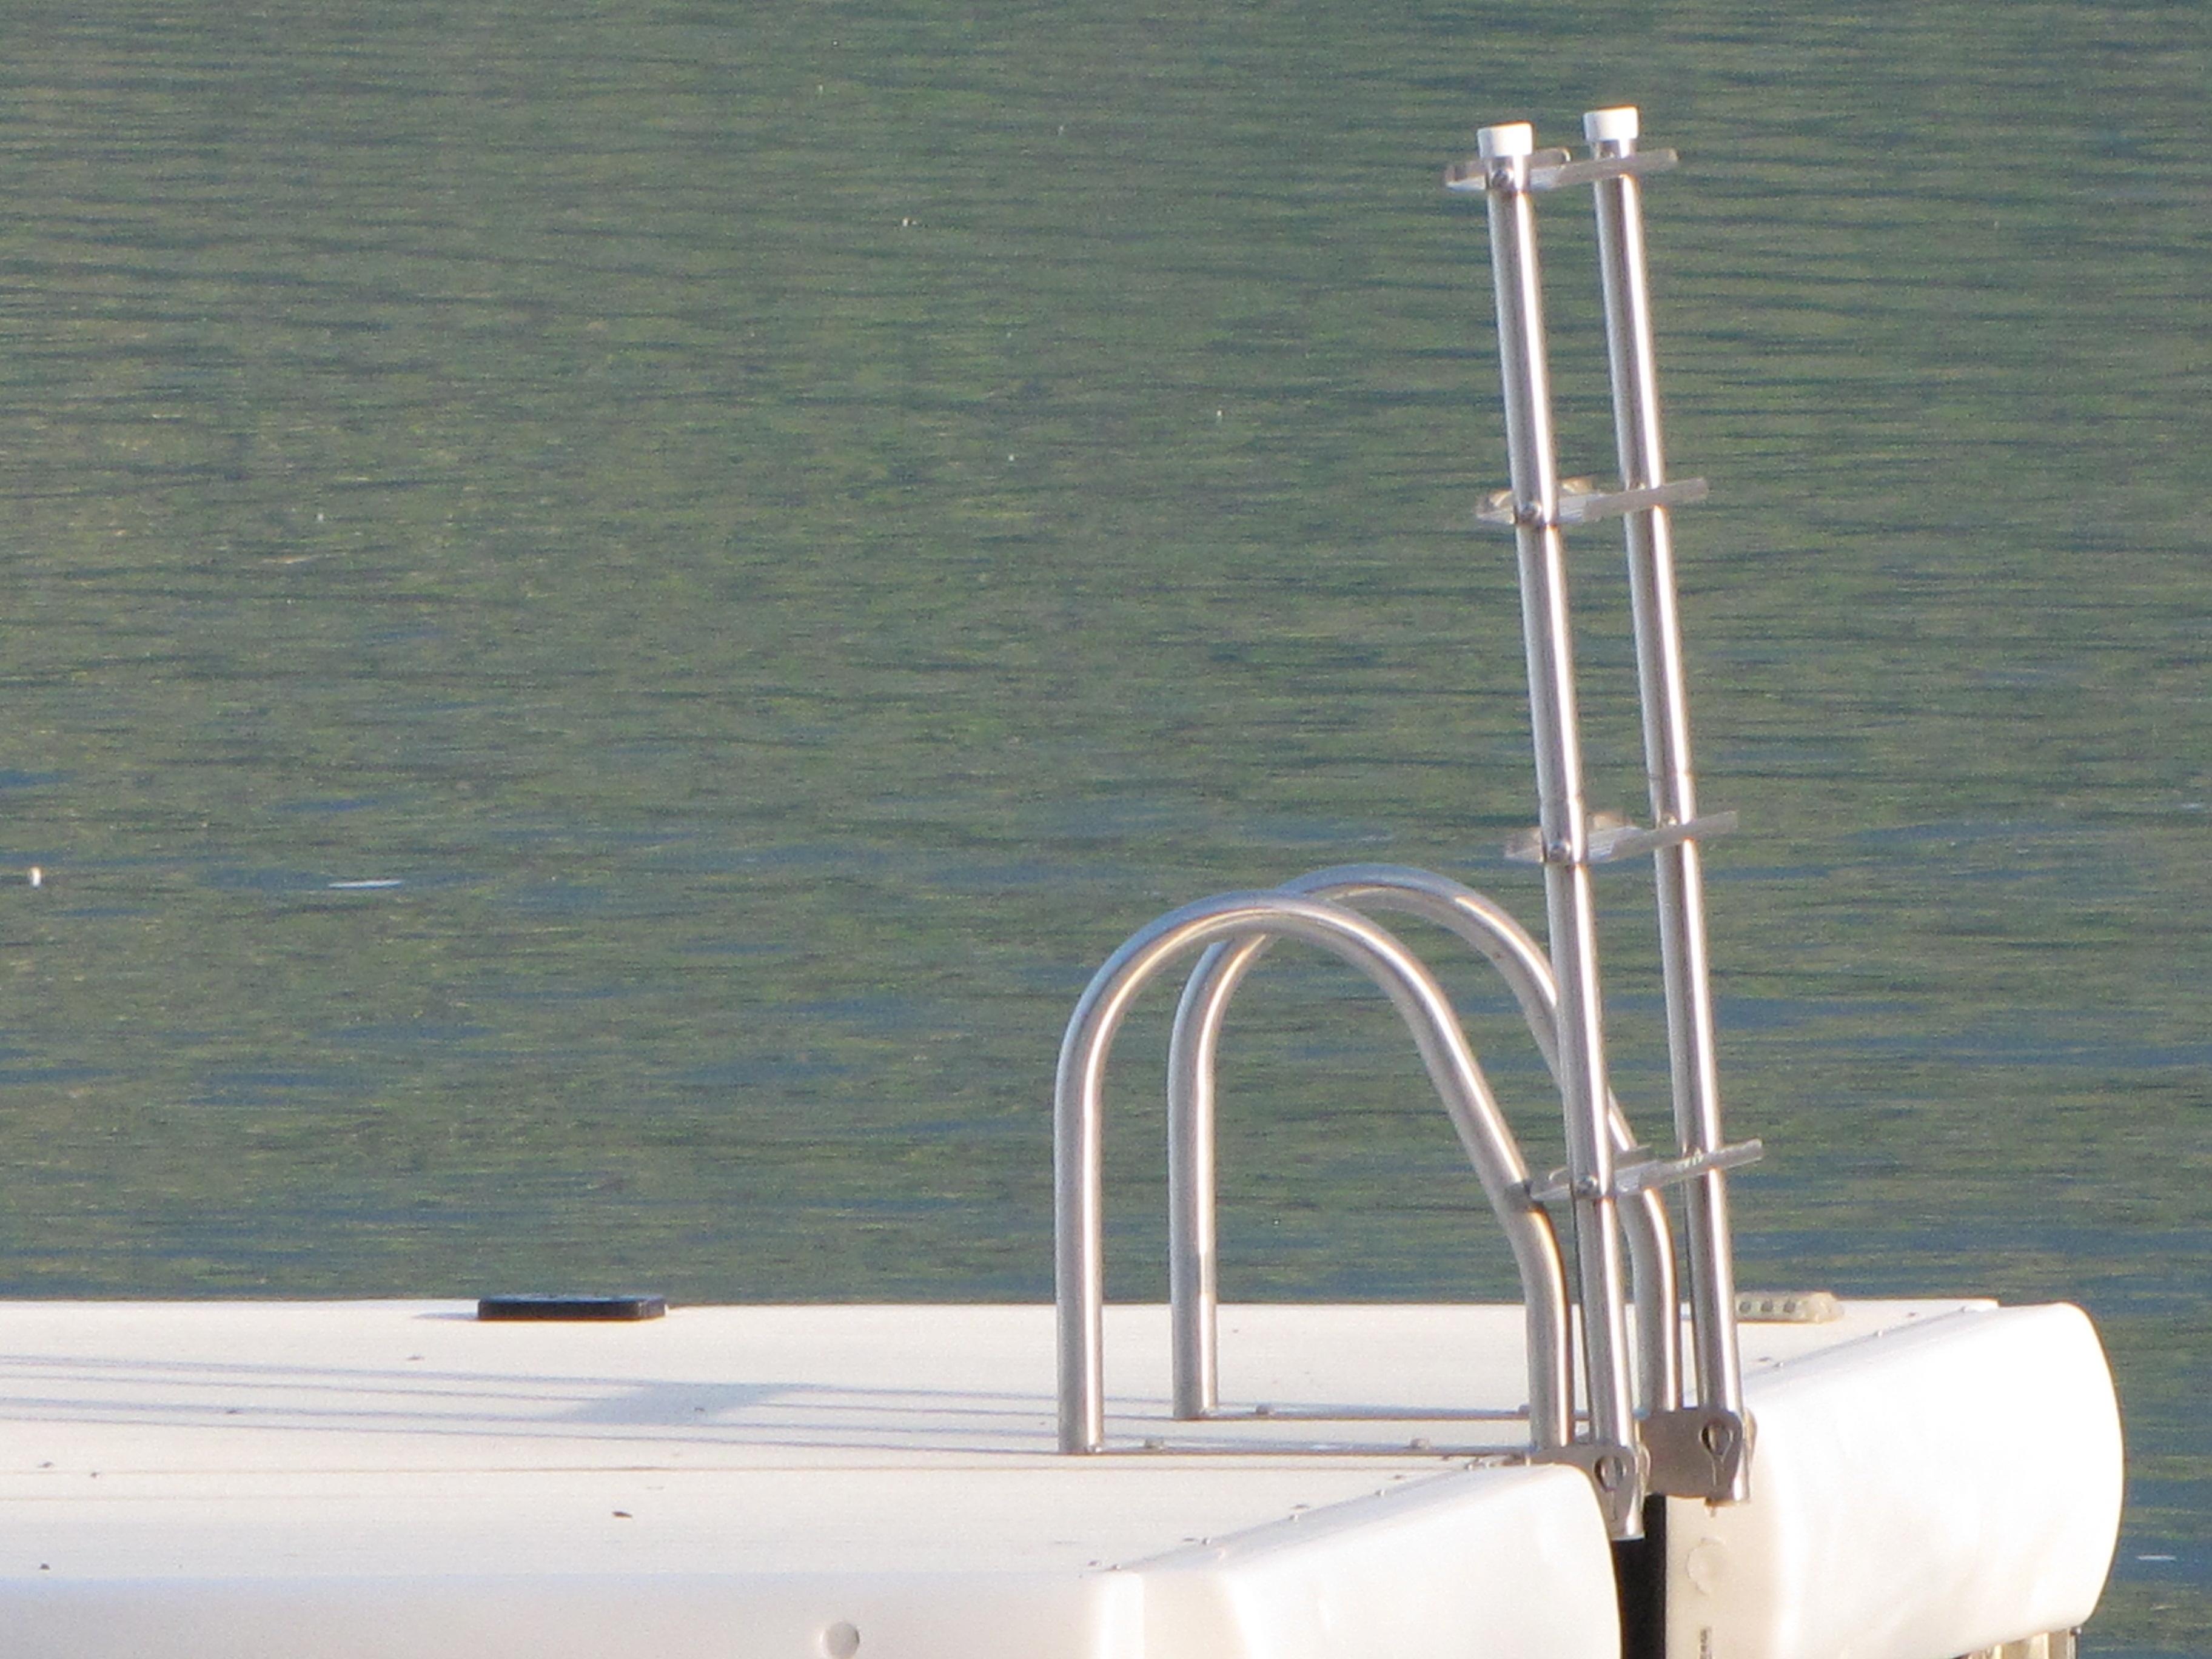 Hardware Amp Accessories Sunbum Boats